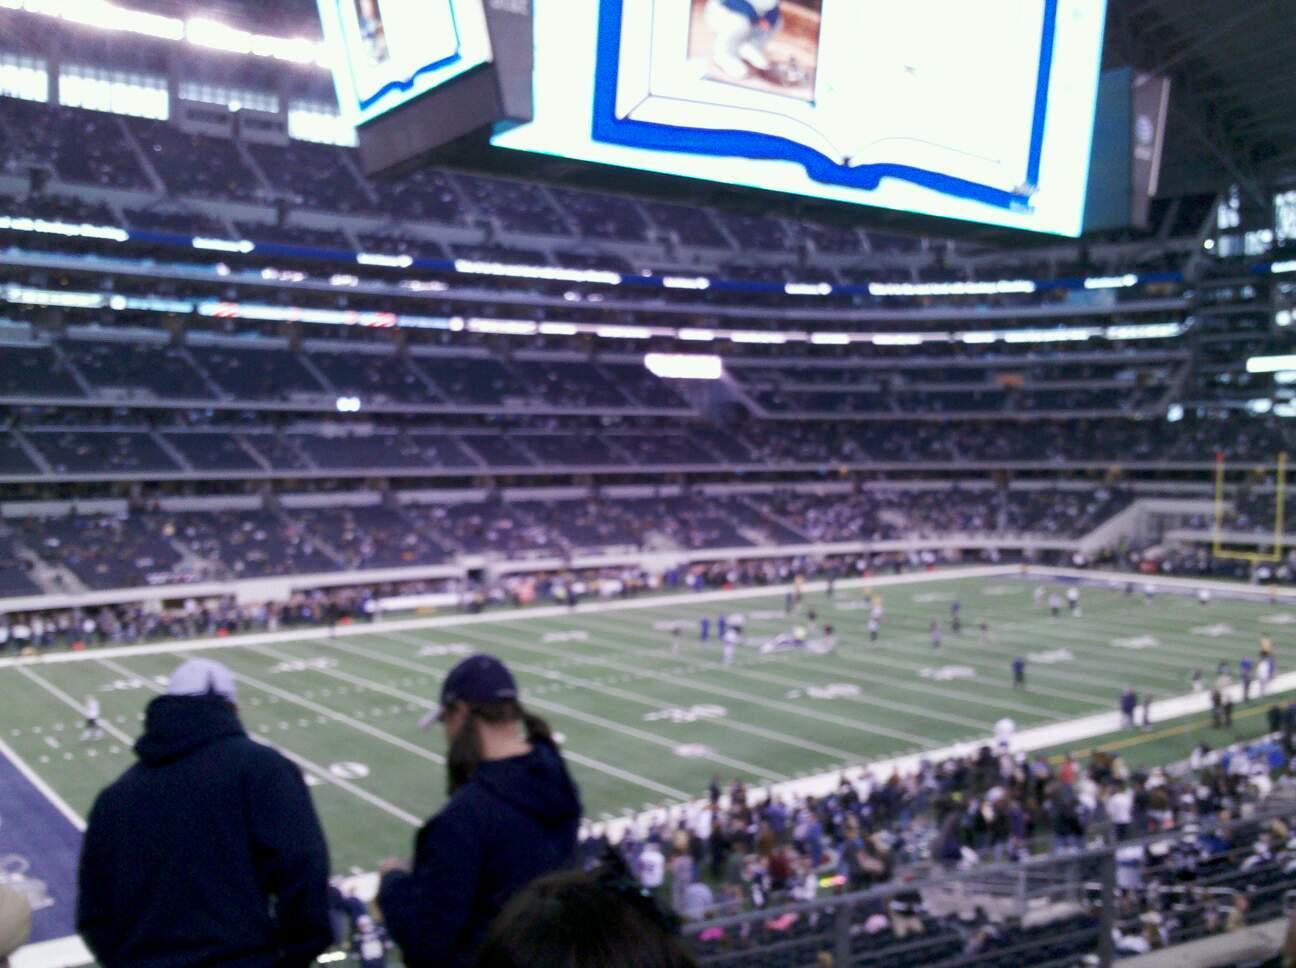 AT&T Stadium Secção C238 Fila 13 Lugar 1